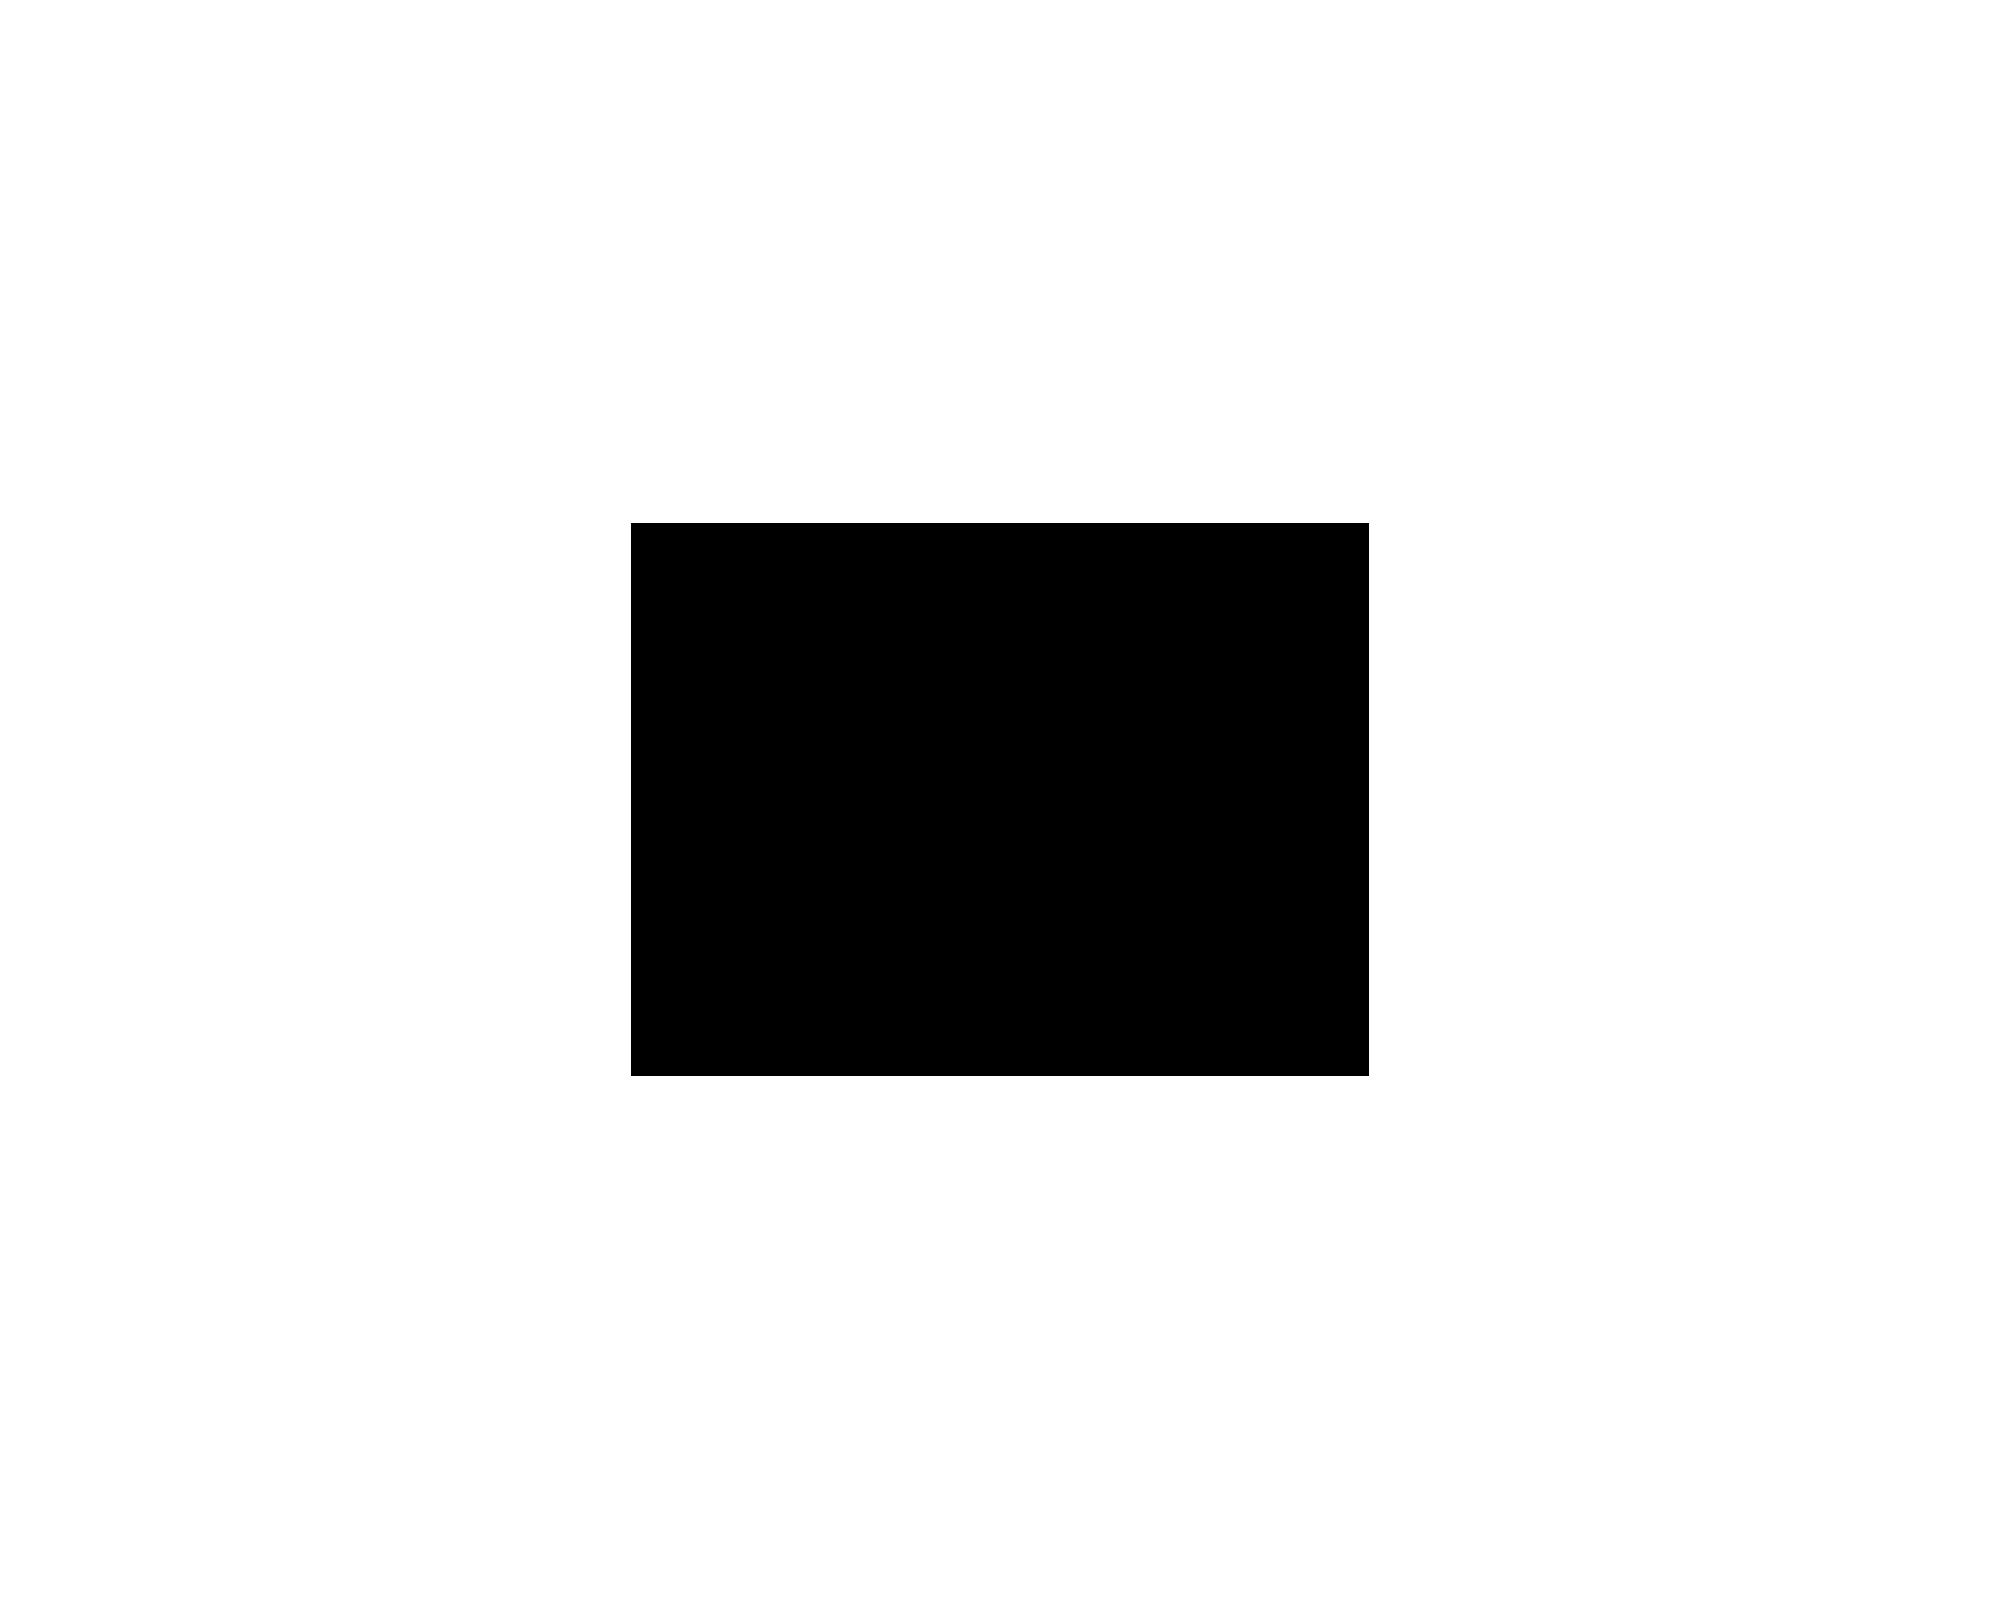 Sennheiser logo.